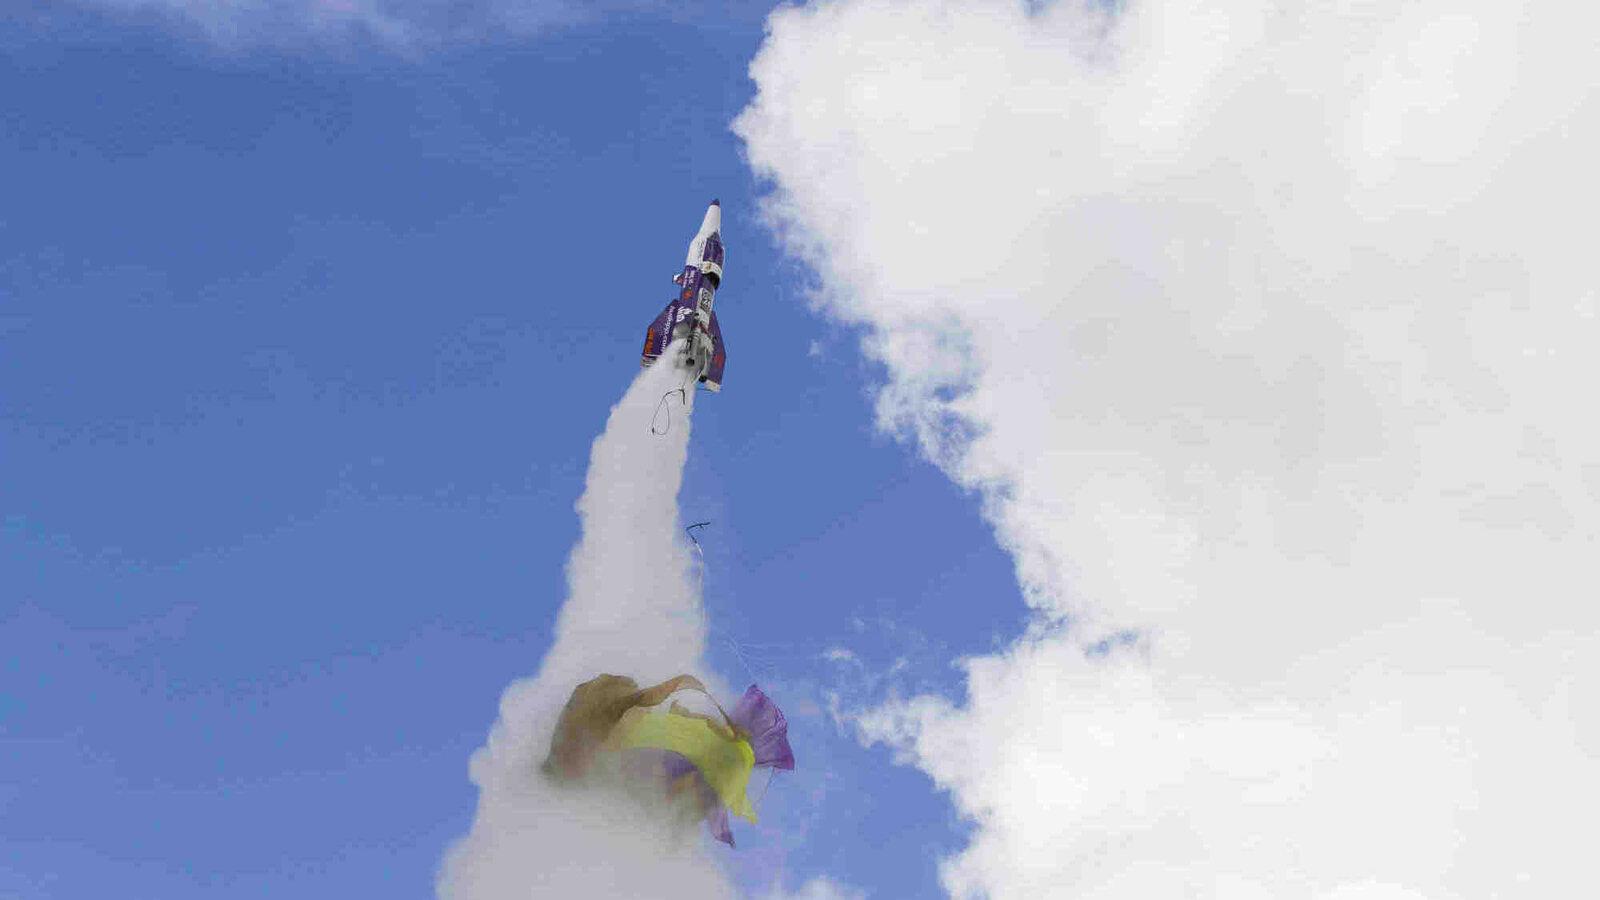 Daredevil dies in homemade-rocket crash